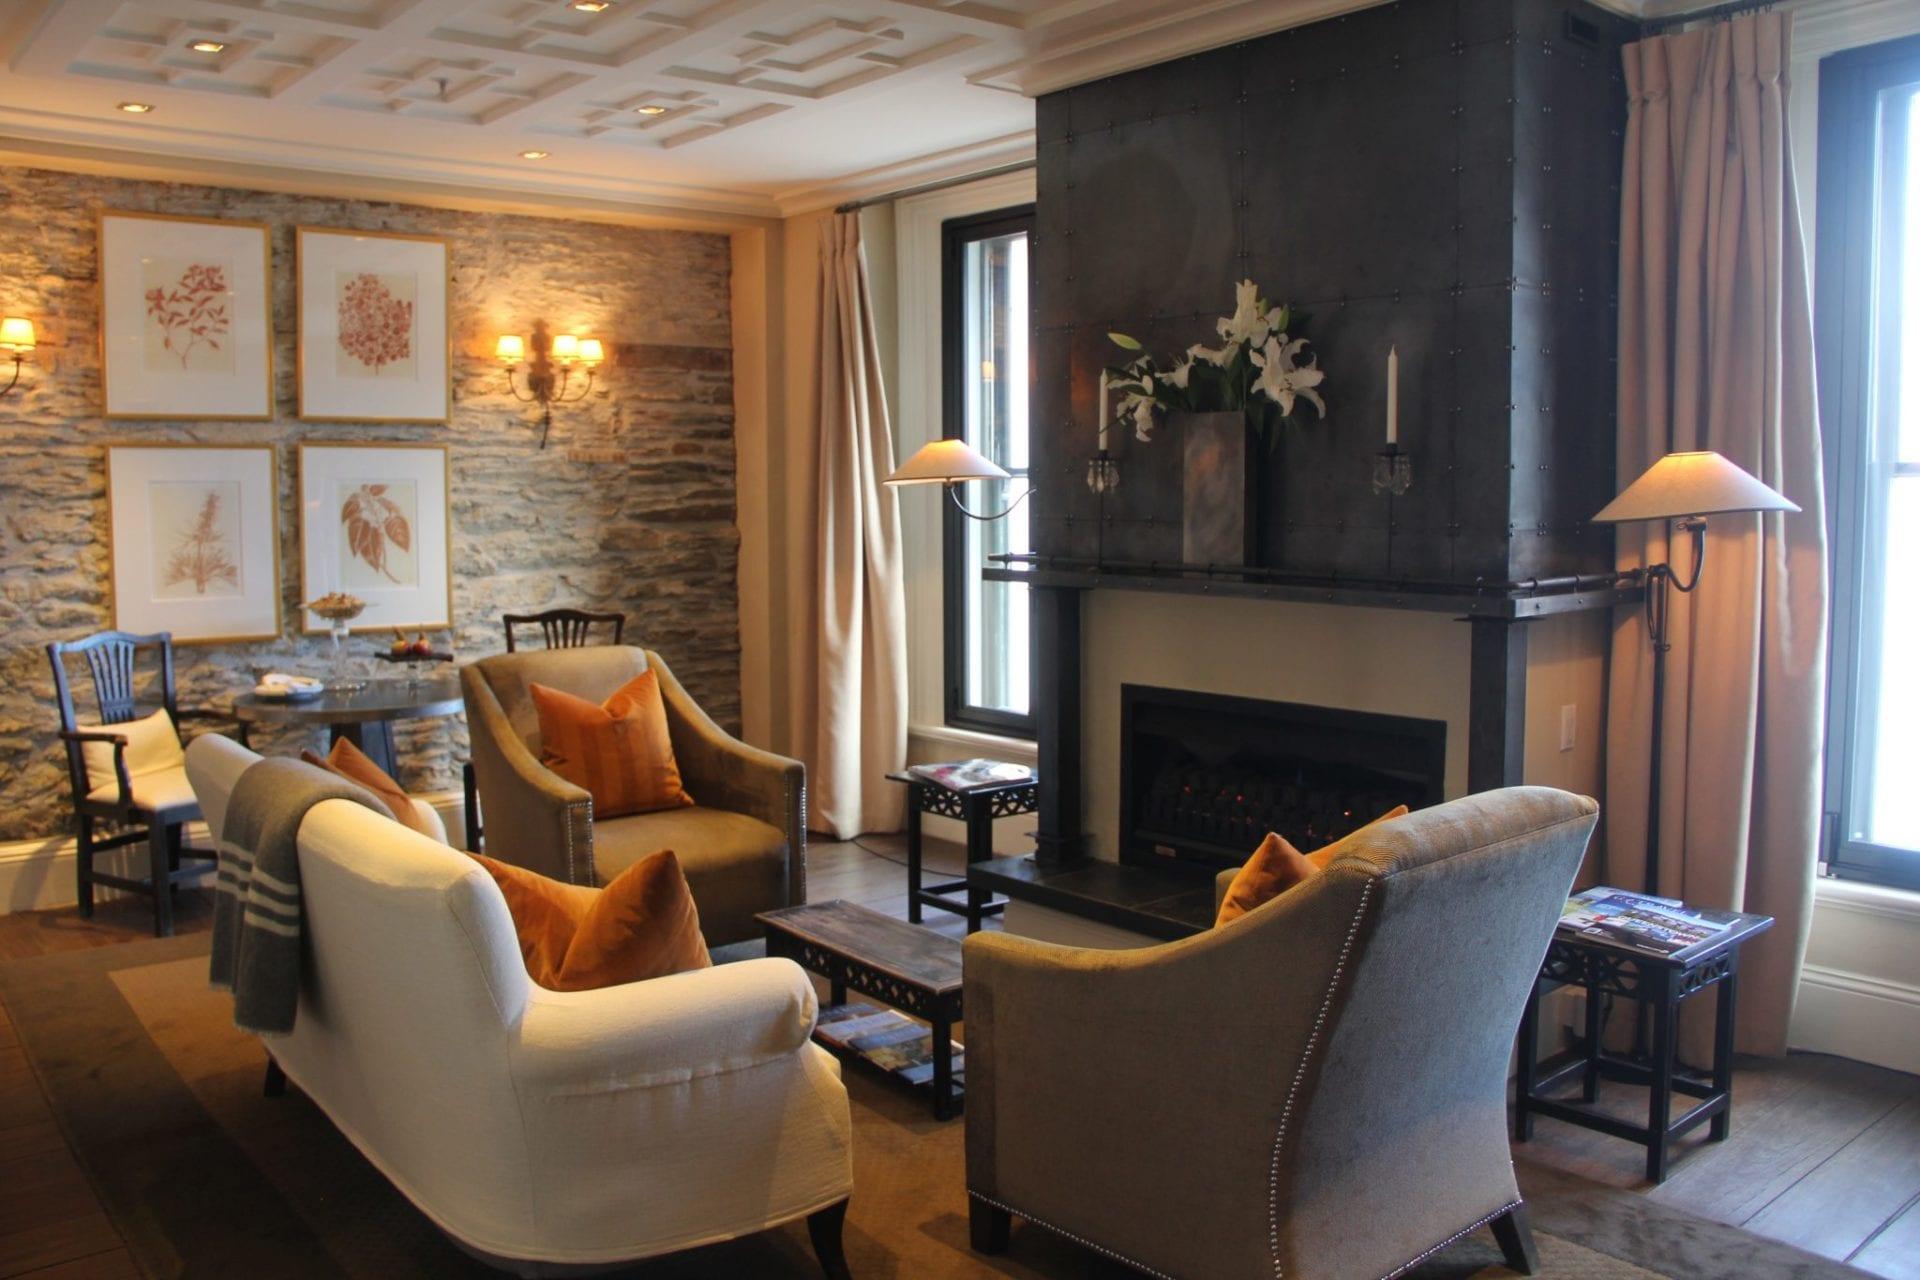 Kostenfreier Inspired Status Bei Den Small Luxury Hotels Reisetopia